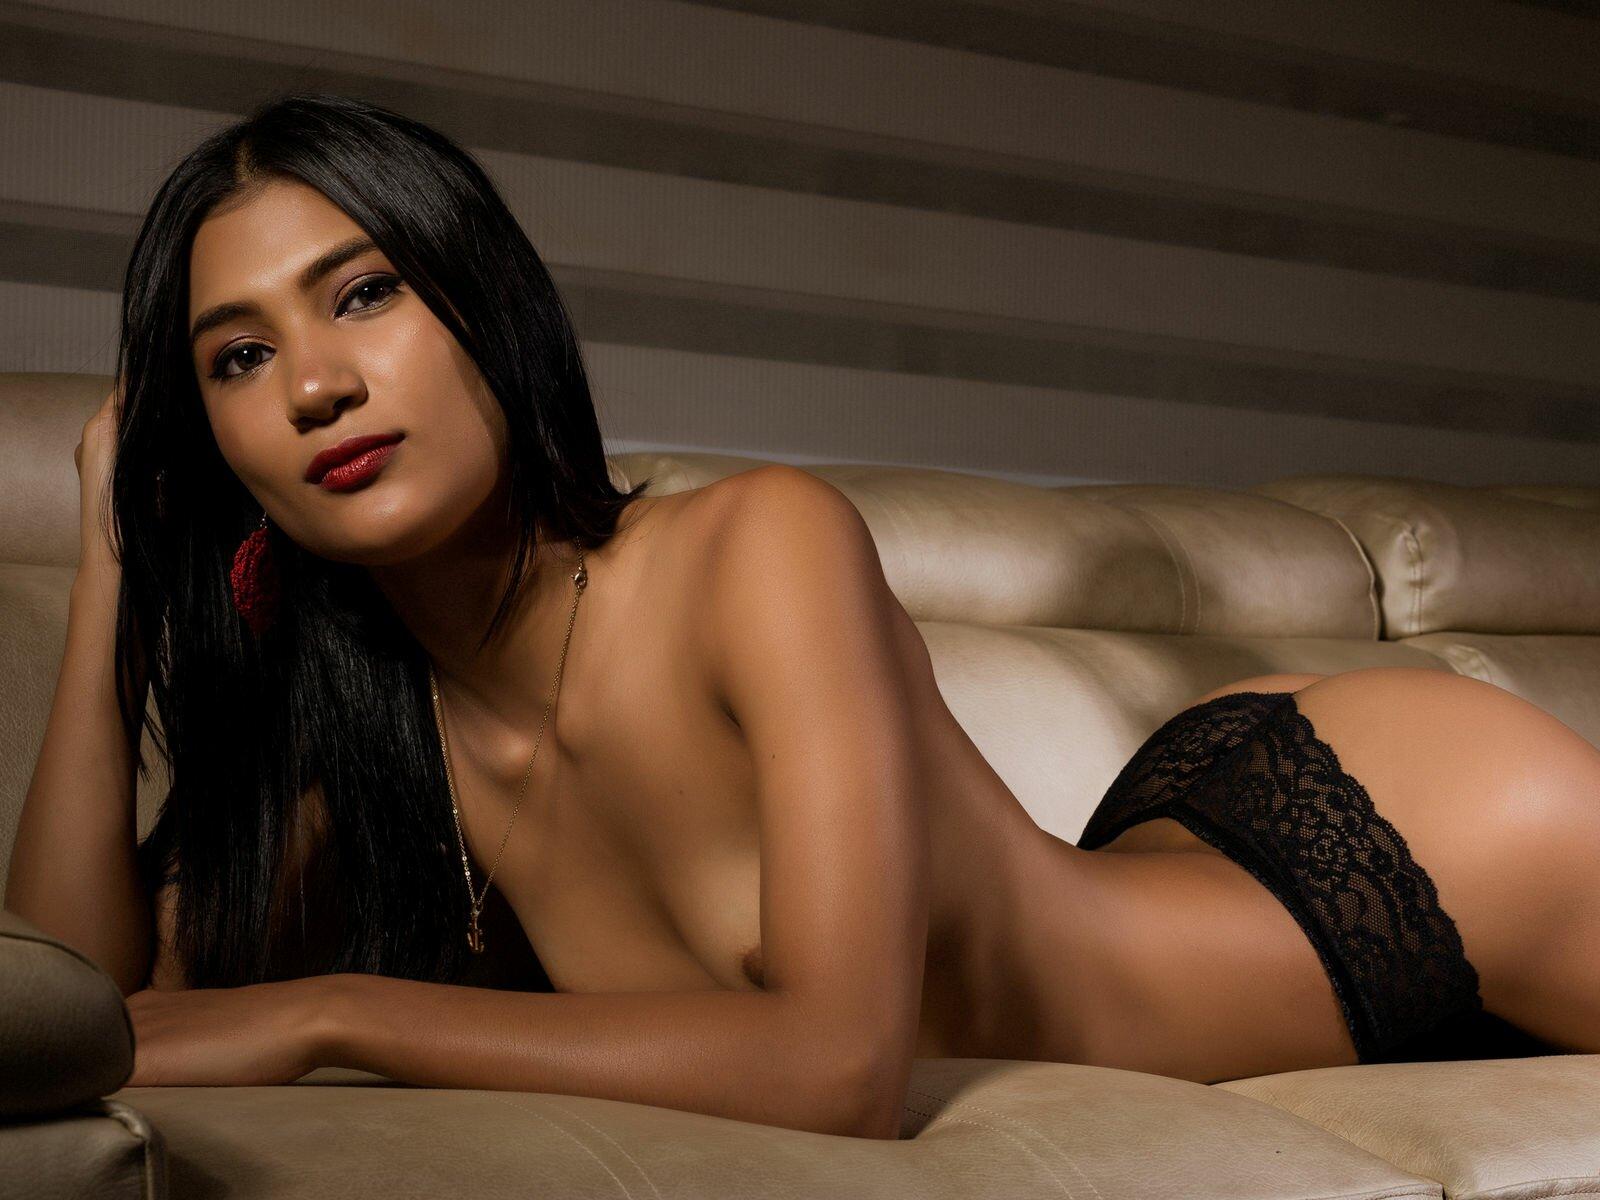 like Best online dating site in europe licks sweetheart